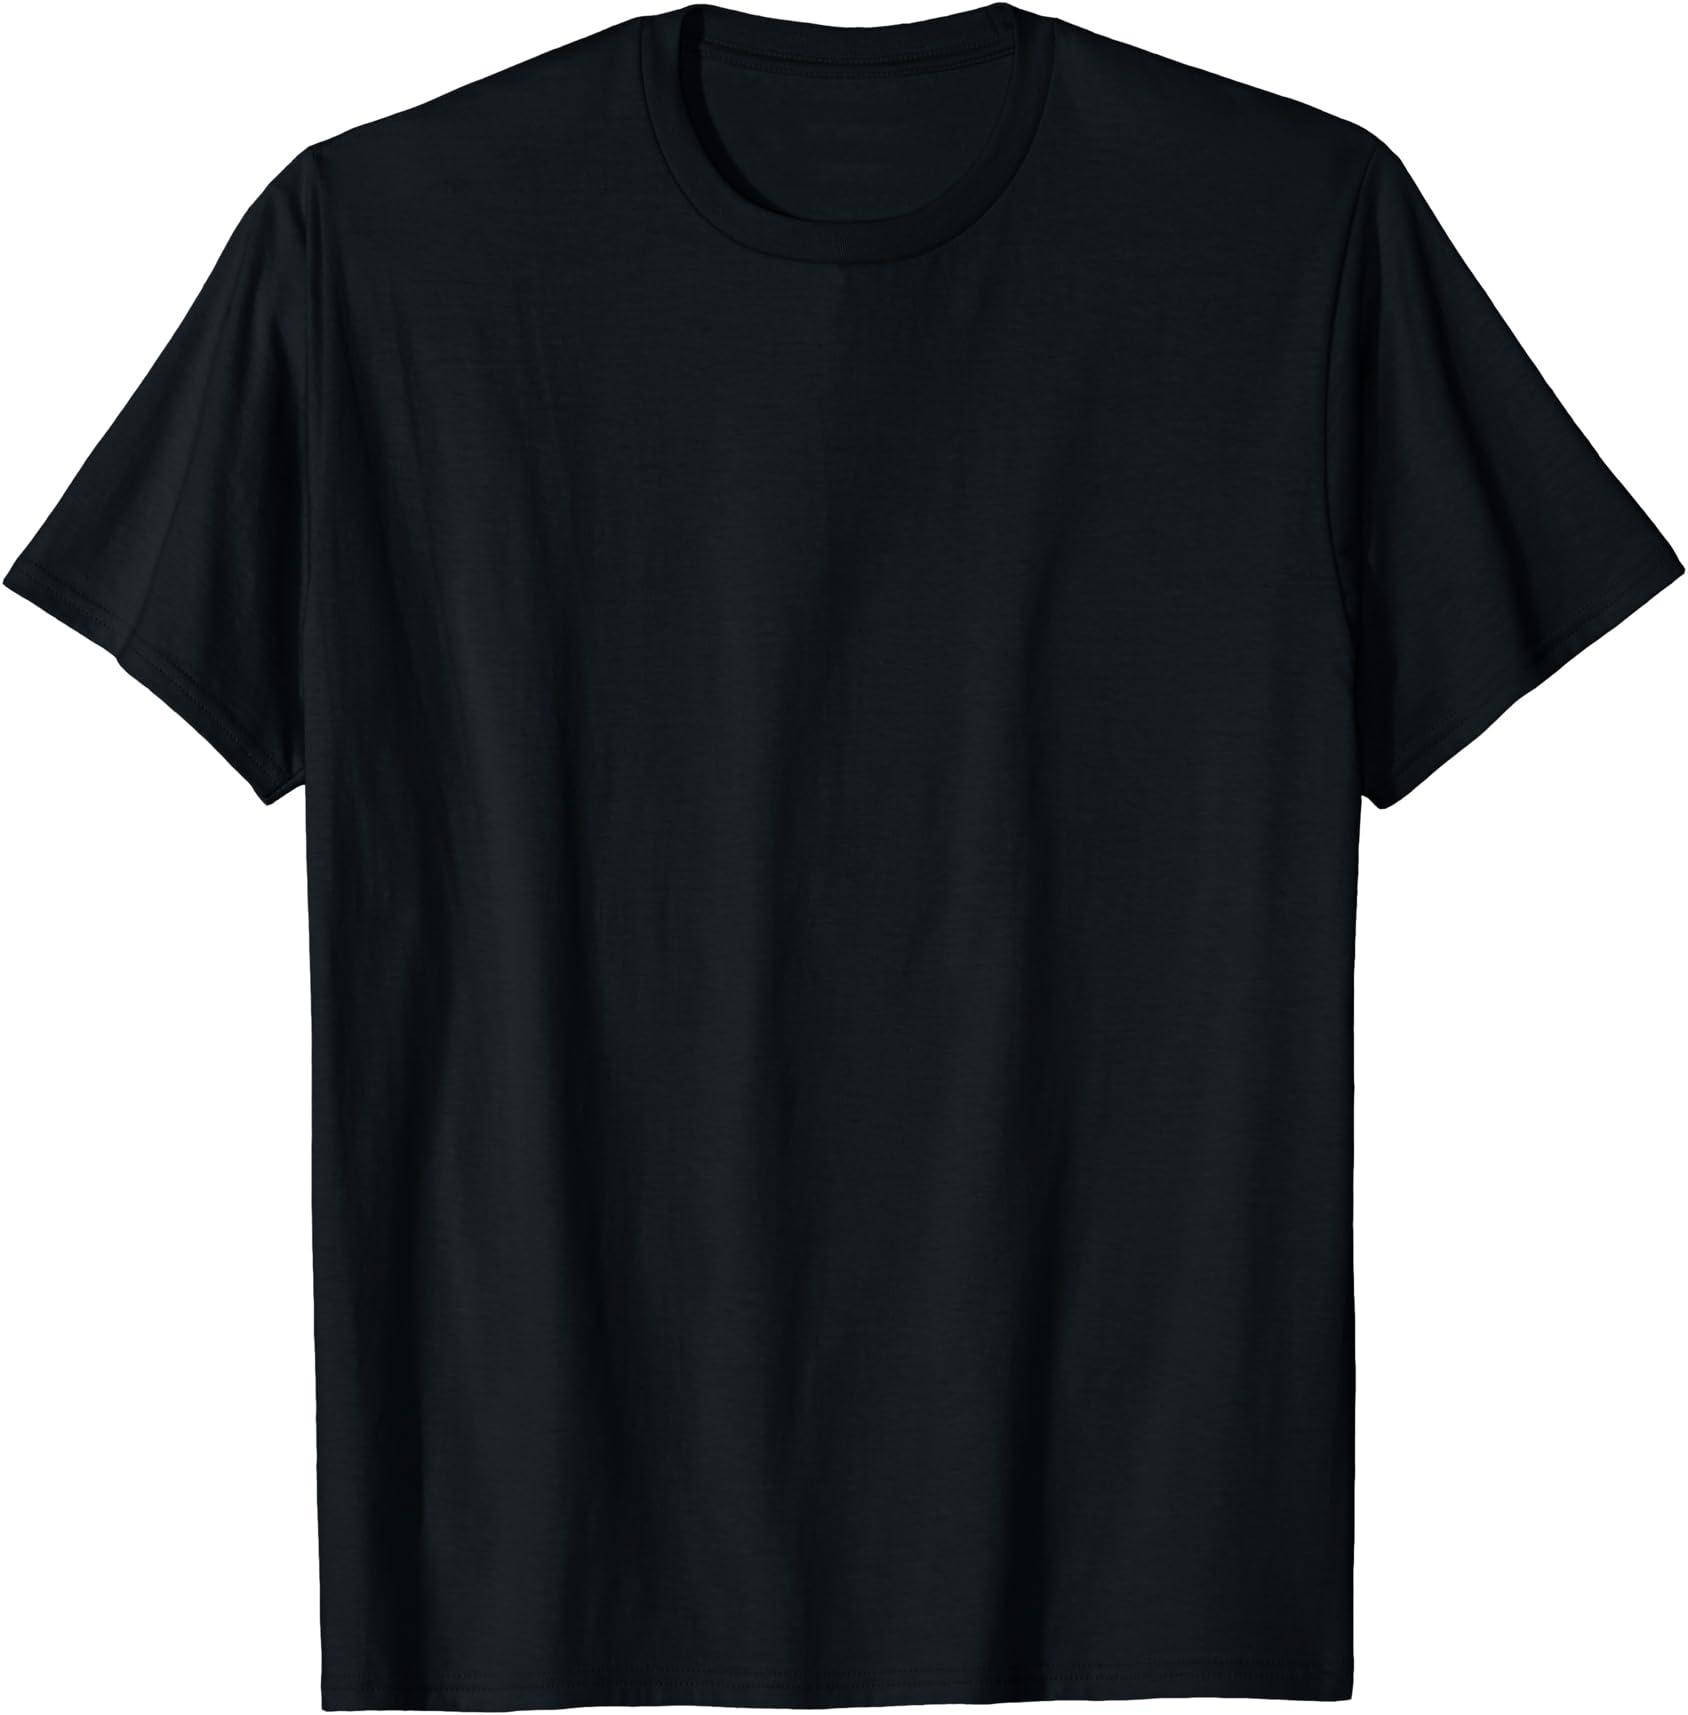 Ireland New T-Shirt Irish Shamrock Repbulic of Top St Patrick/'s Day